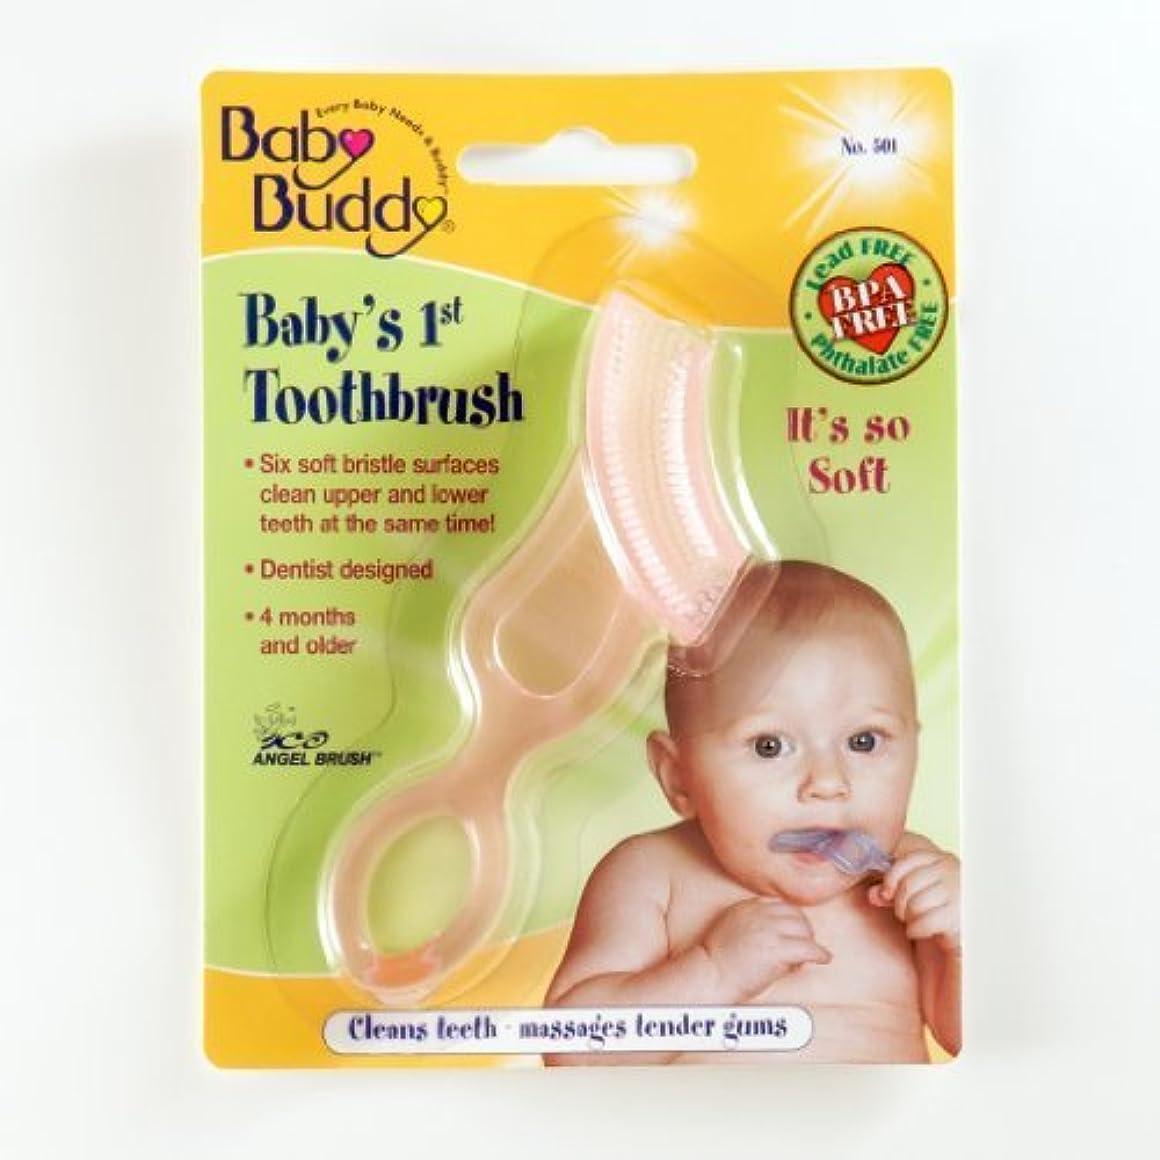 雑種器用鷲Baby Buddy: Baby's 1st Toothbrush by Baby Buddy [並行輸入品]